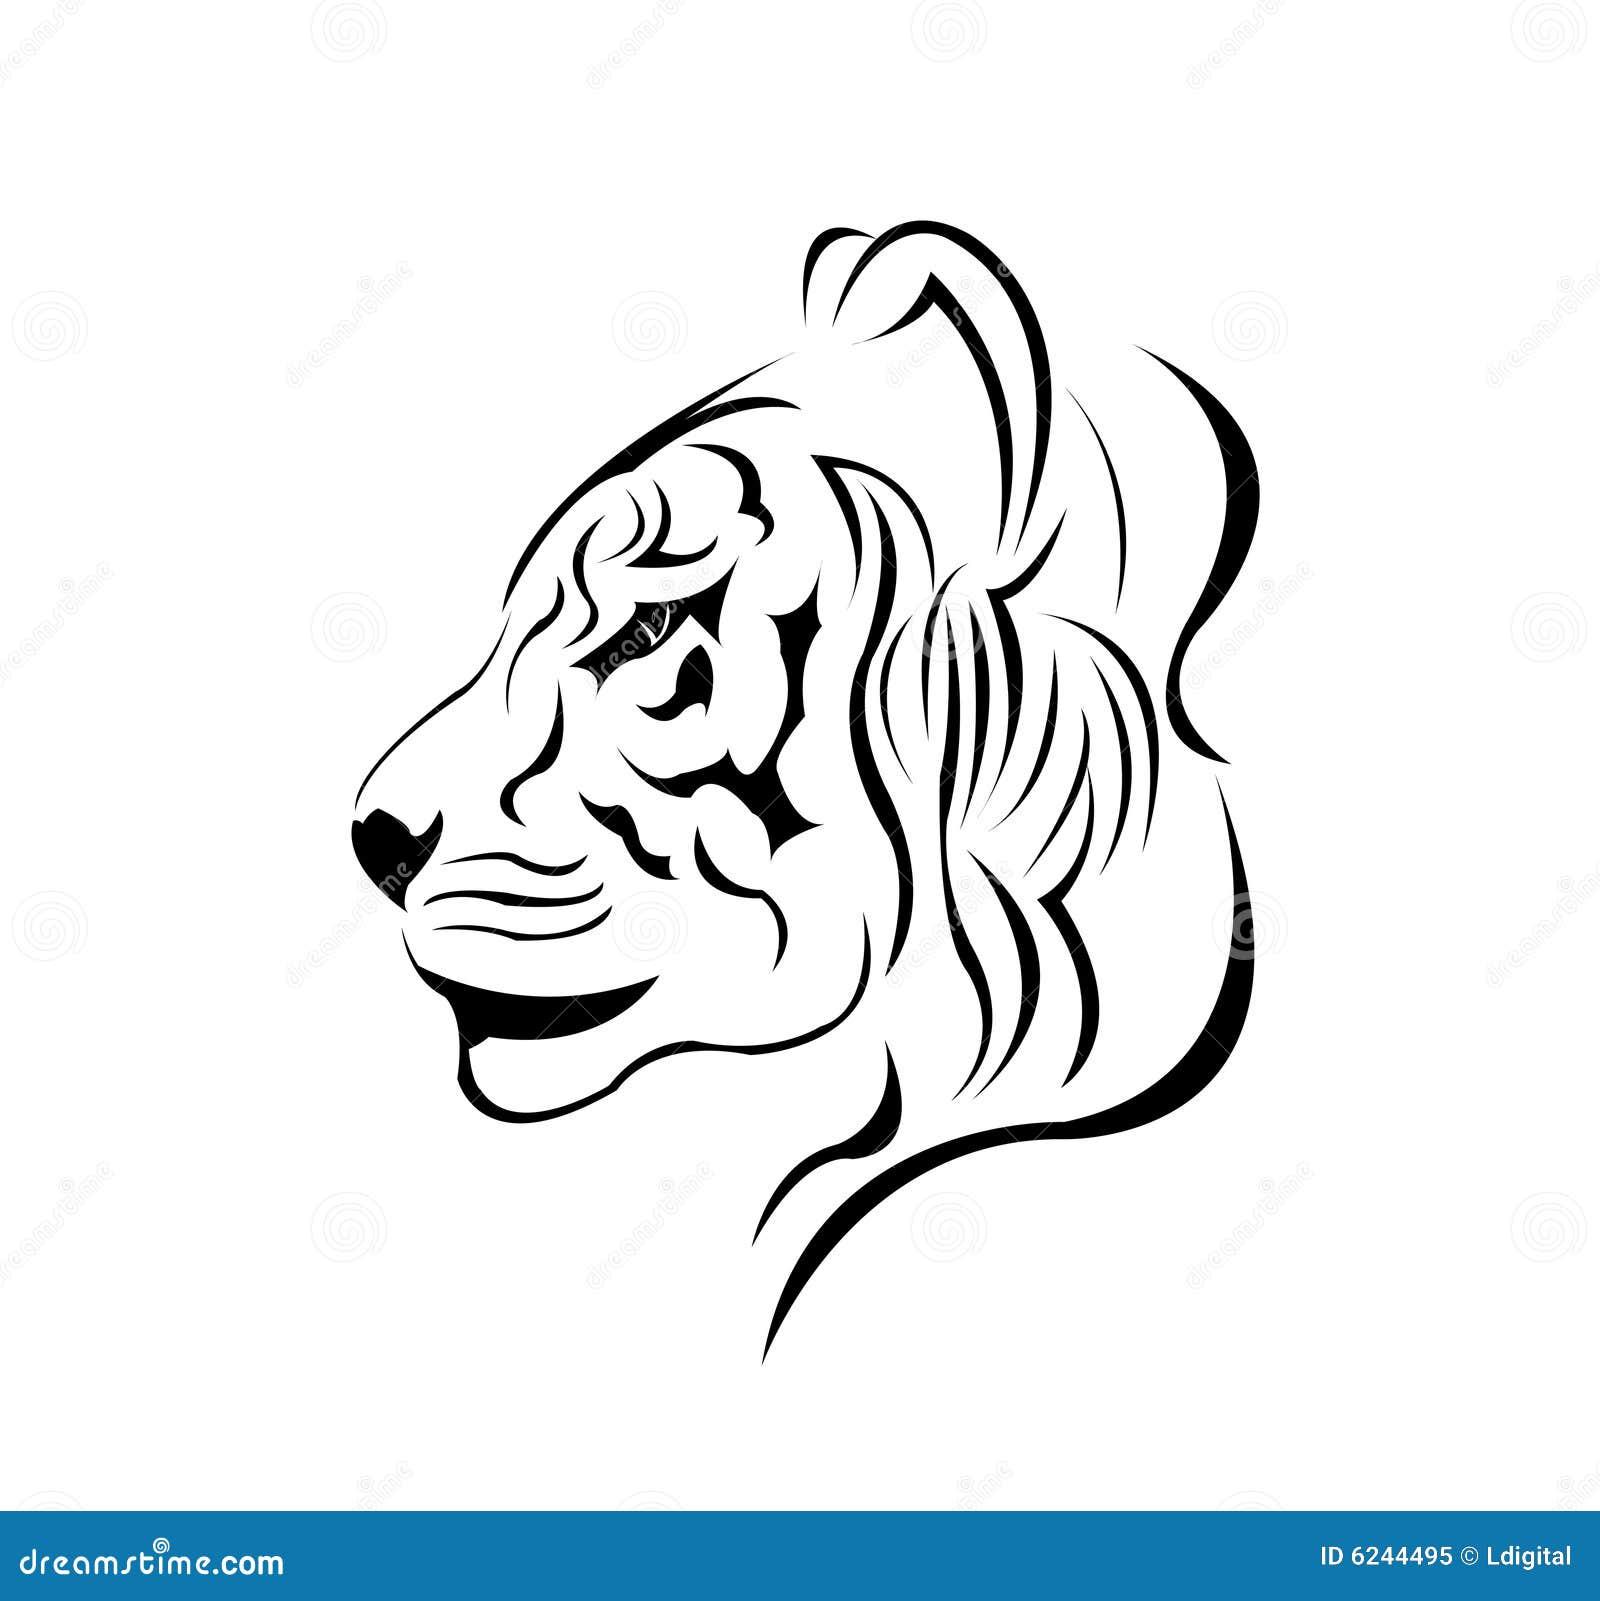 Tattoo Designs Download: A Beautiful Tiger Tattoo Design Vector Stock Vector